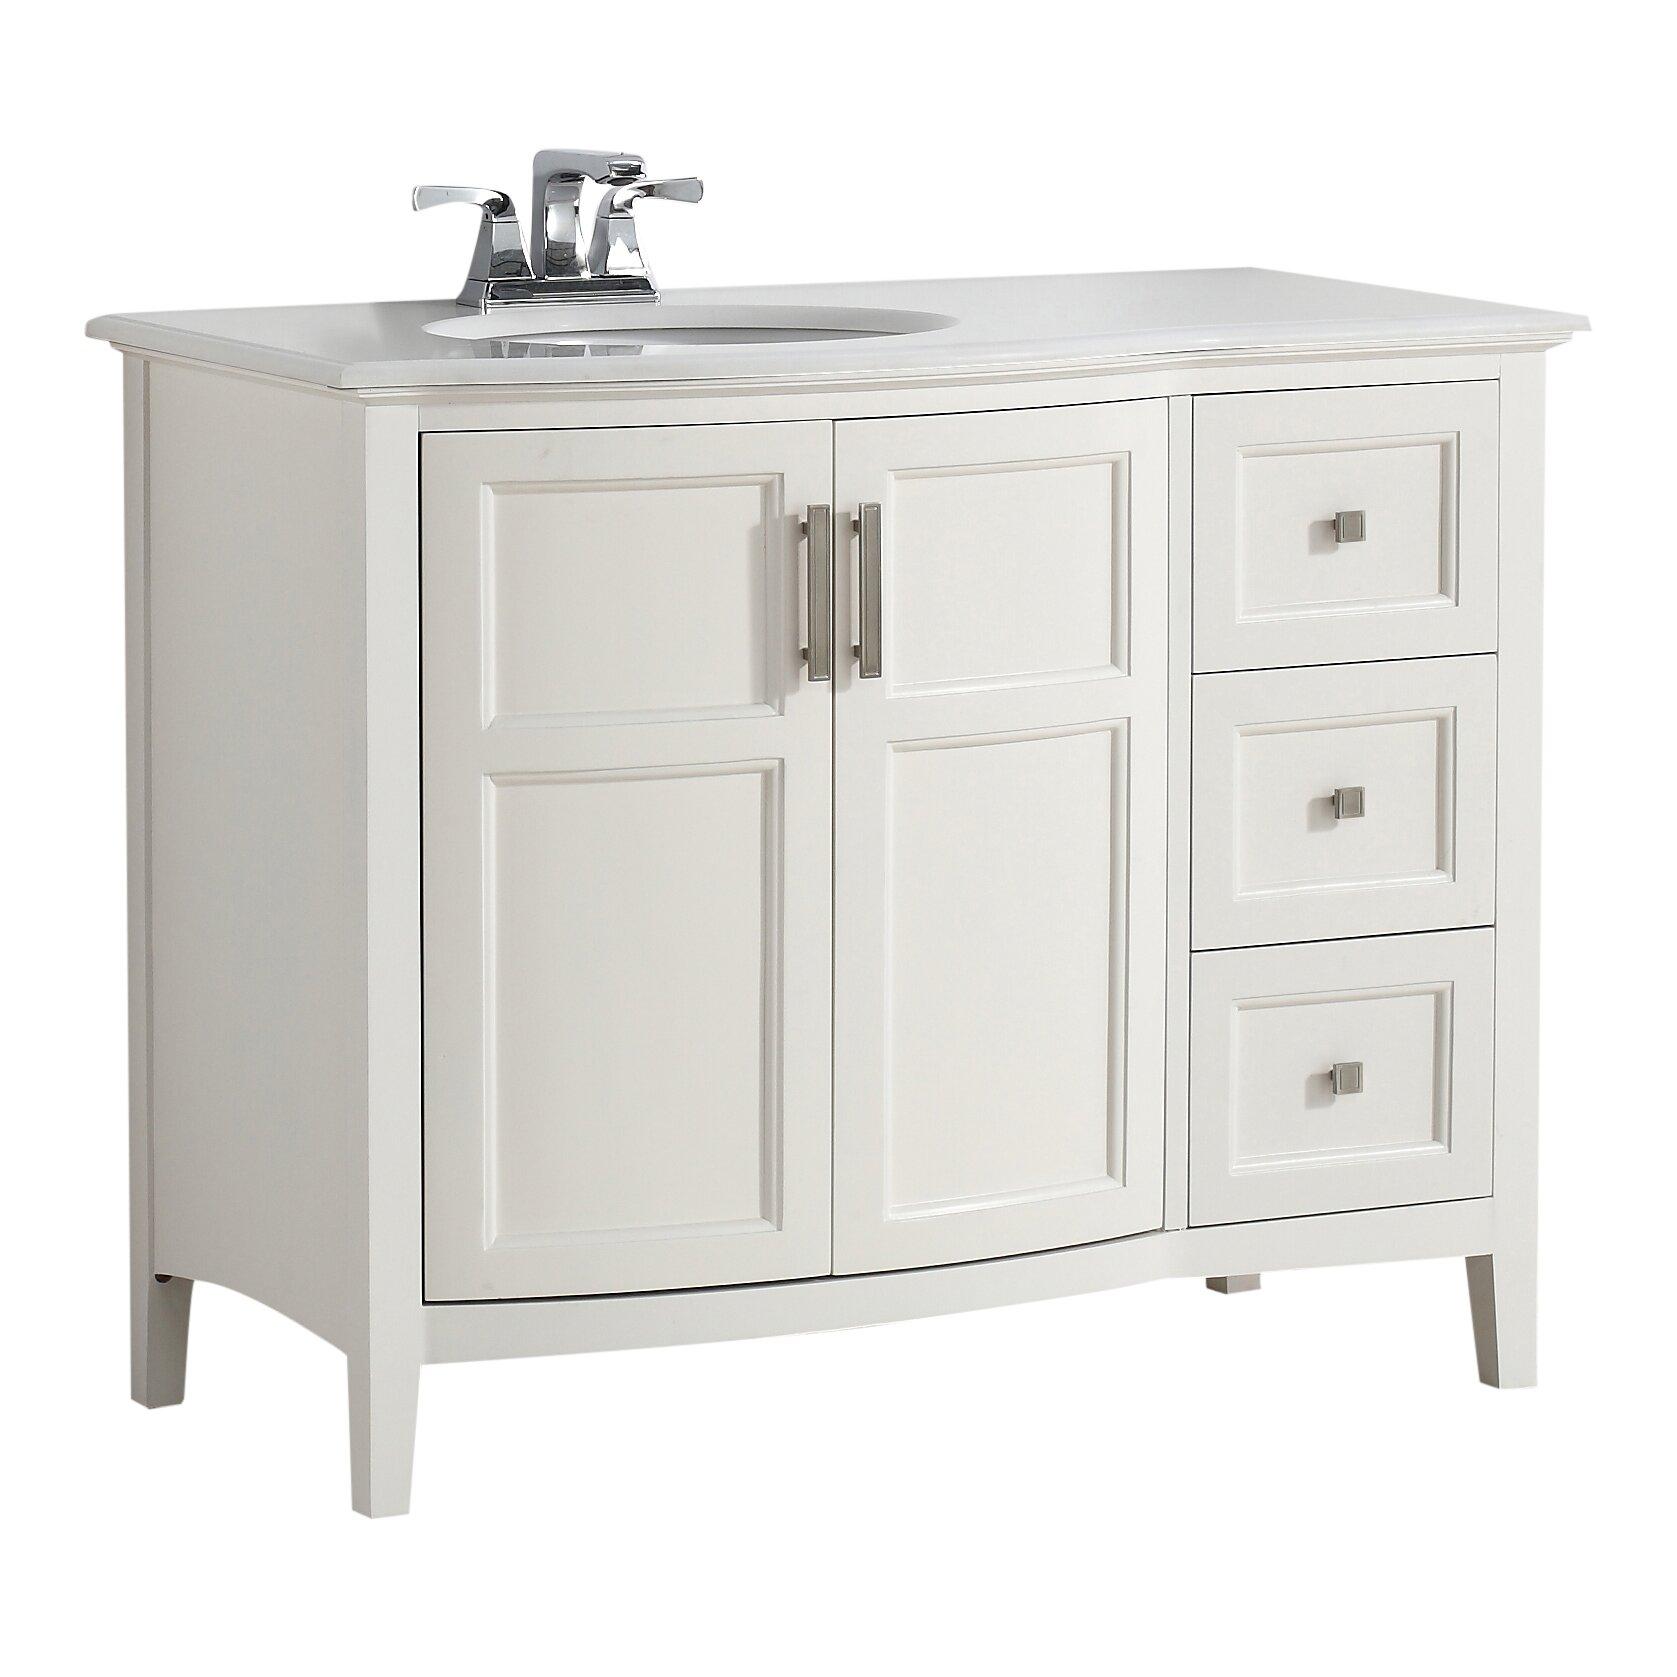 "Simpli Home Winston 43"" Single Rounded Front Bath Vanity Set & Revie"